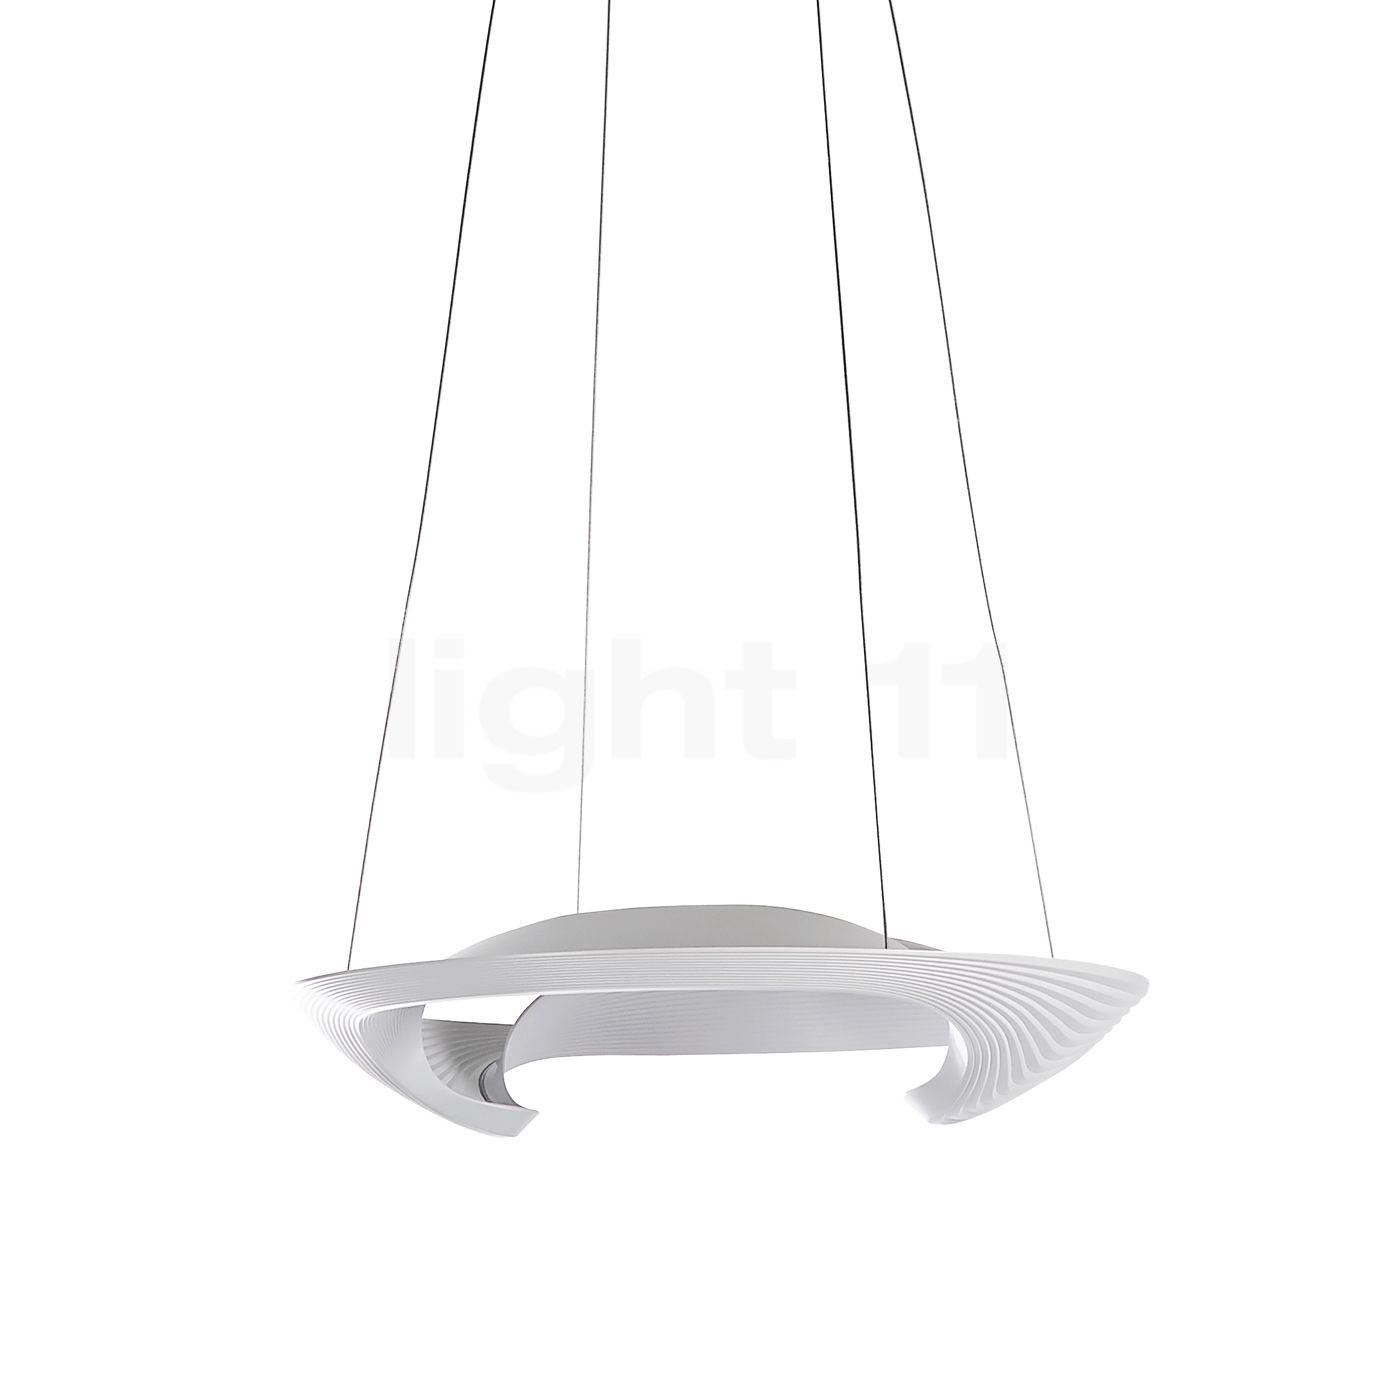 cini nils sestessa cabrio led cob hanglamp. Black Bedroom Furniture Sets. Home Design Ideas